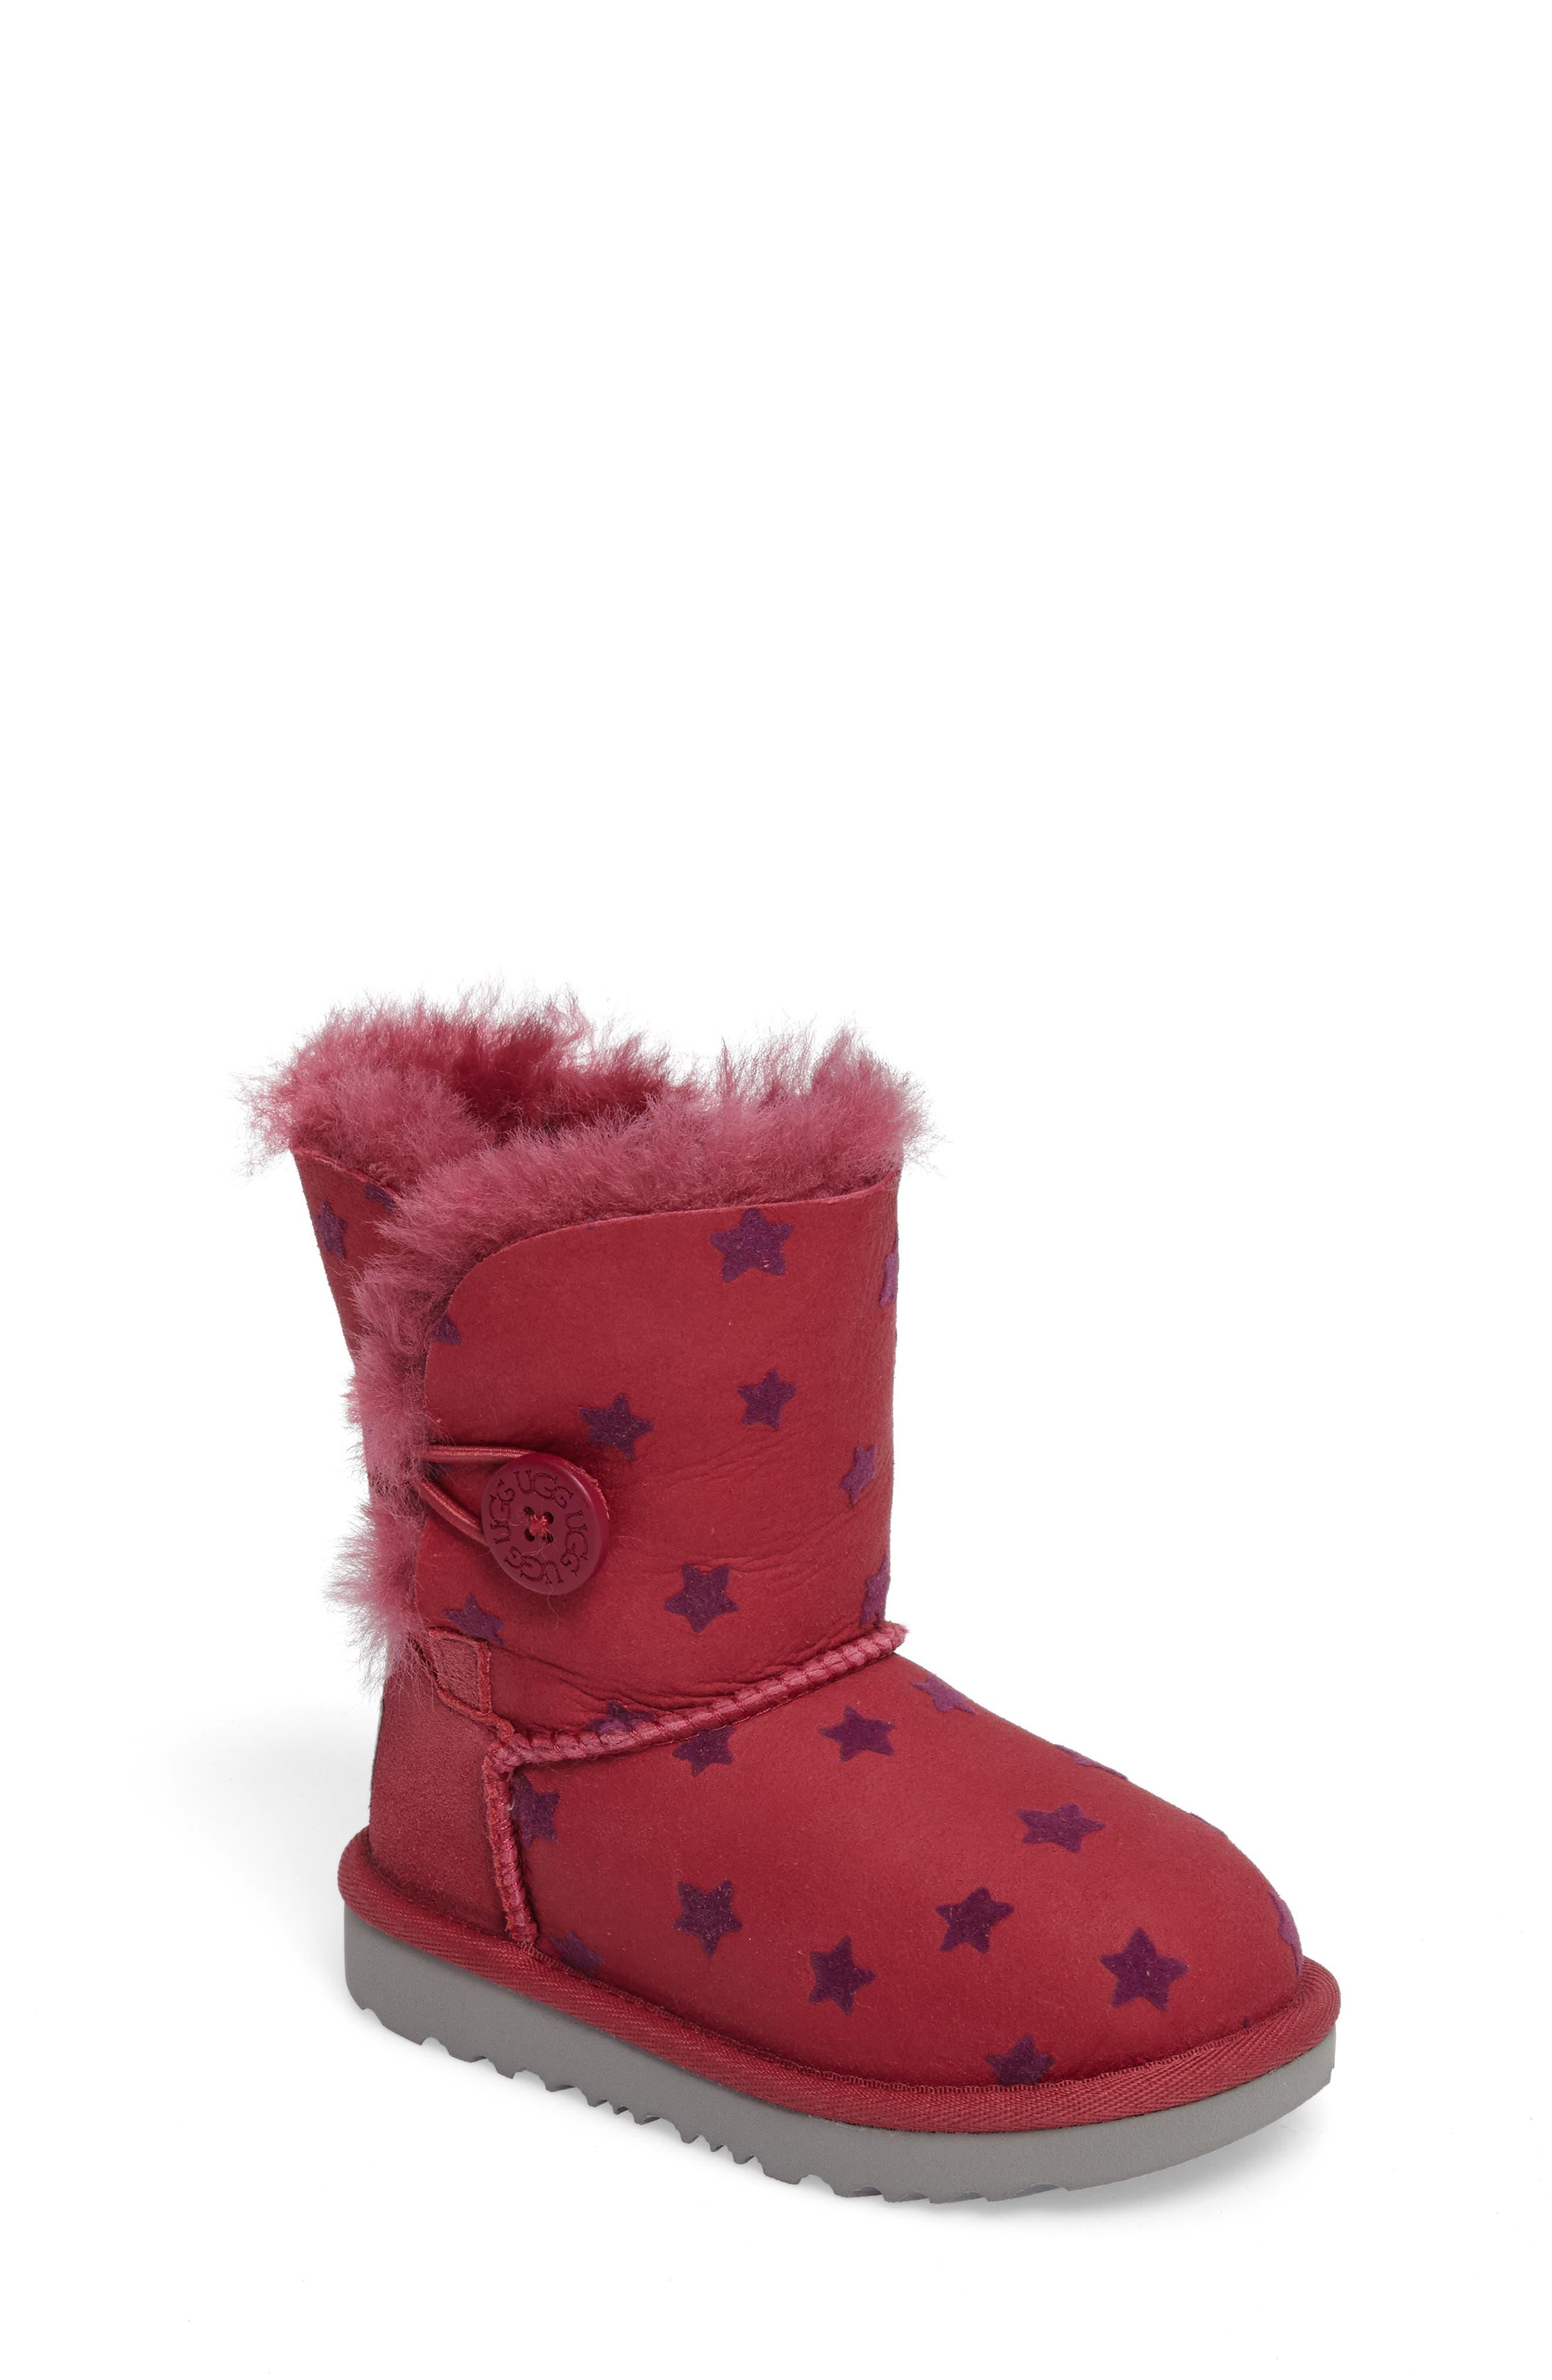 UGG® Bailey Button II Water-Resistant Genuine Shearling Stars Boot (Walker, Toddler, Little Kid & Big Kid)